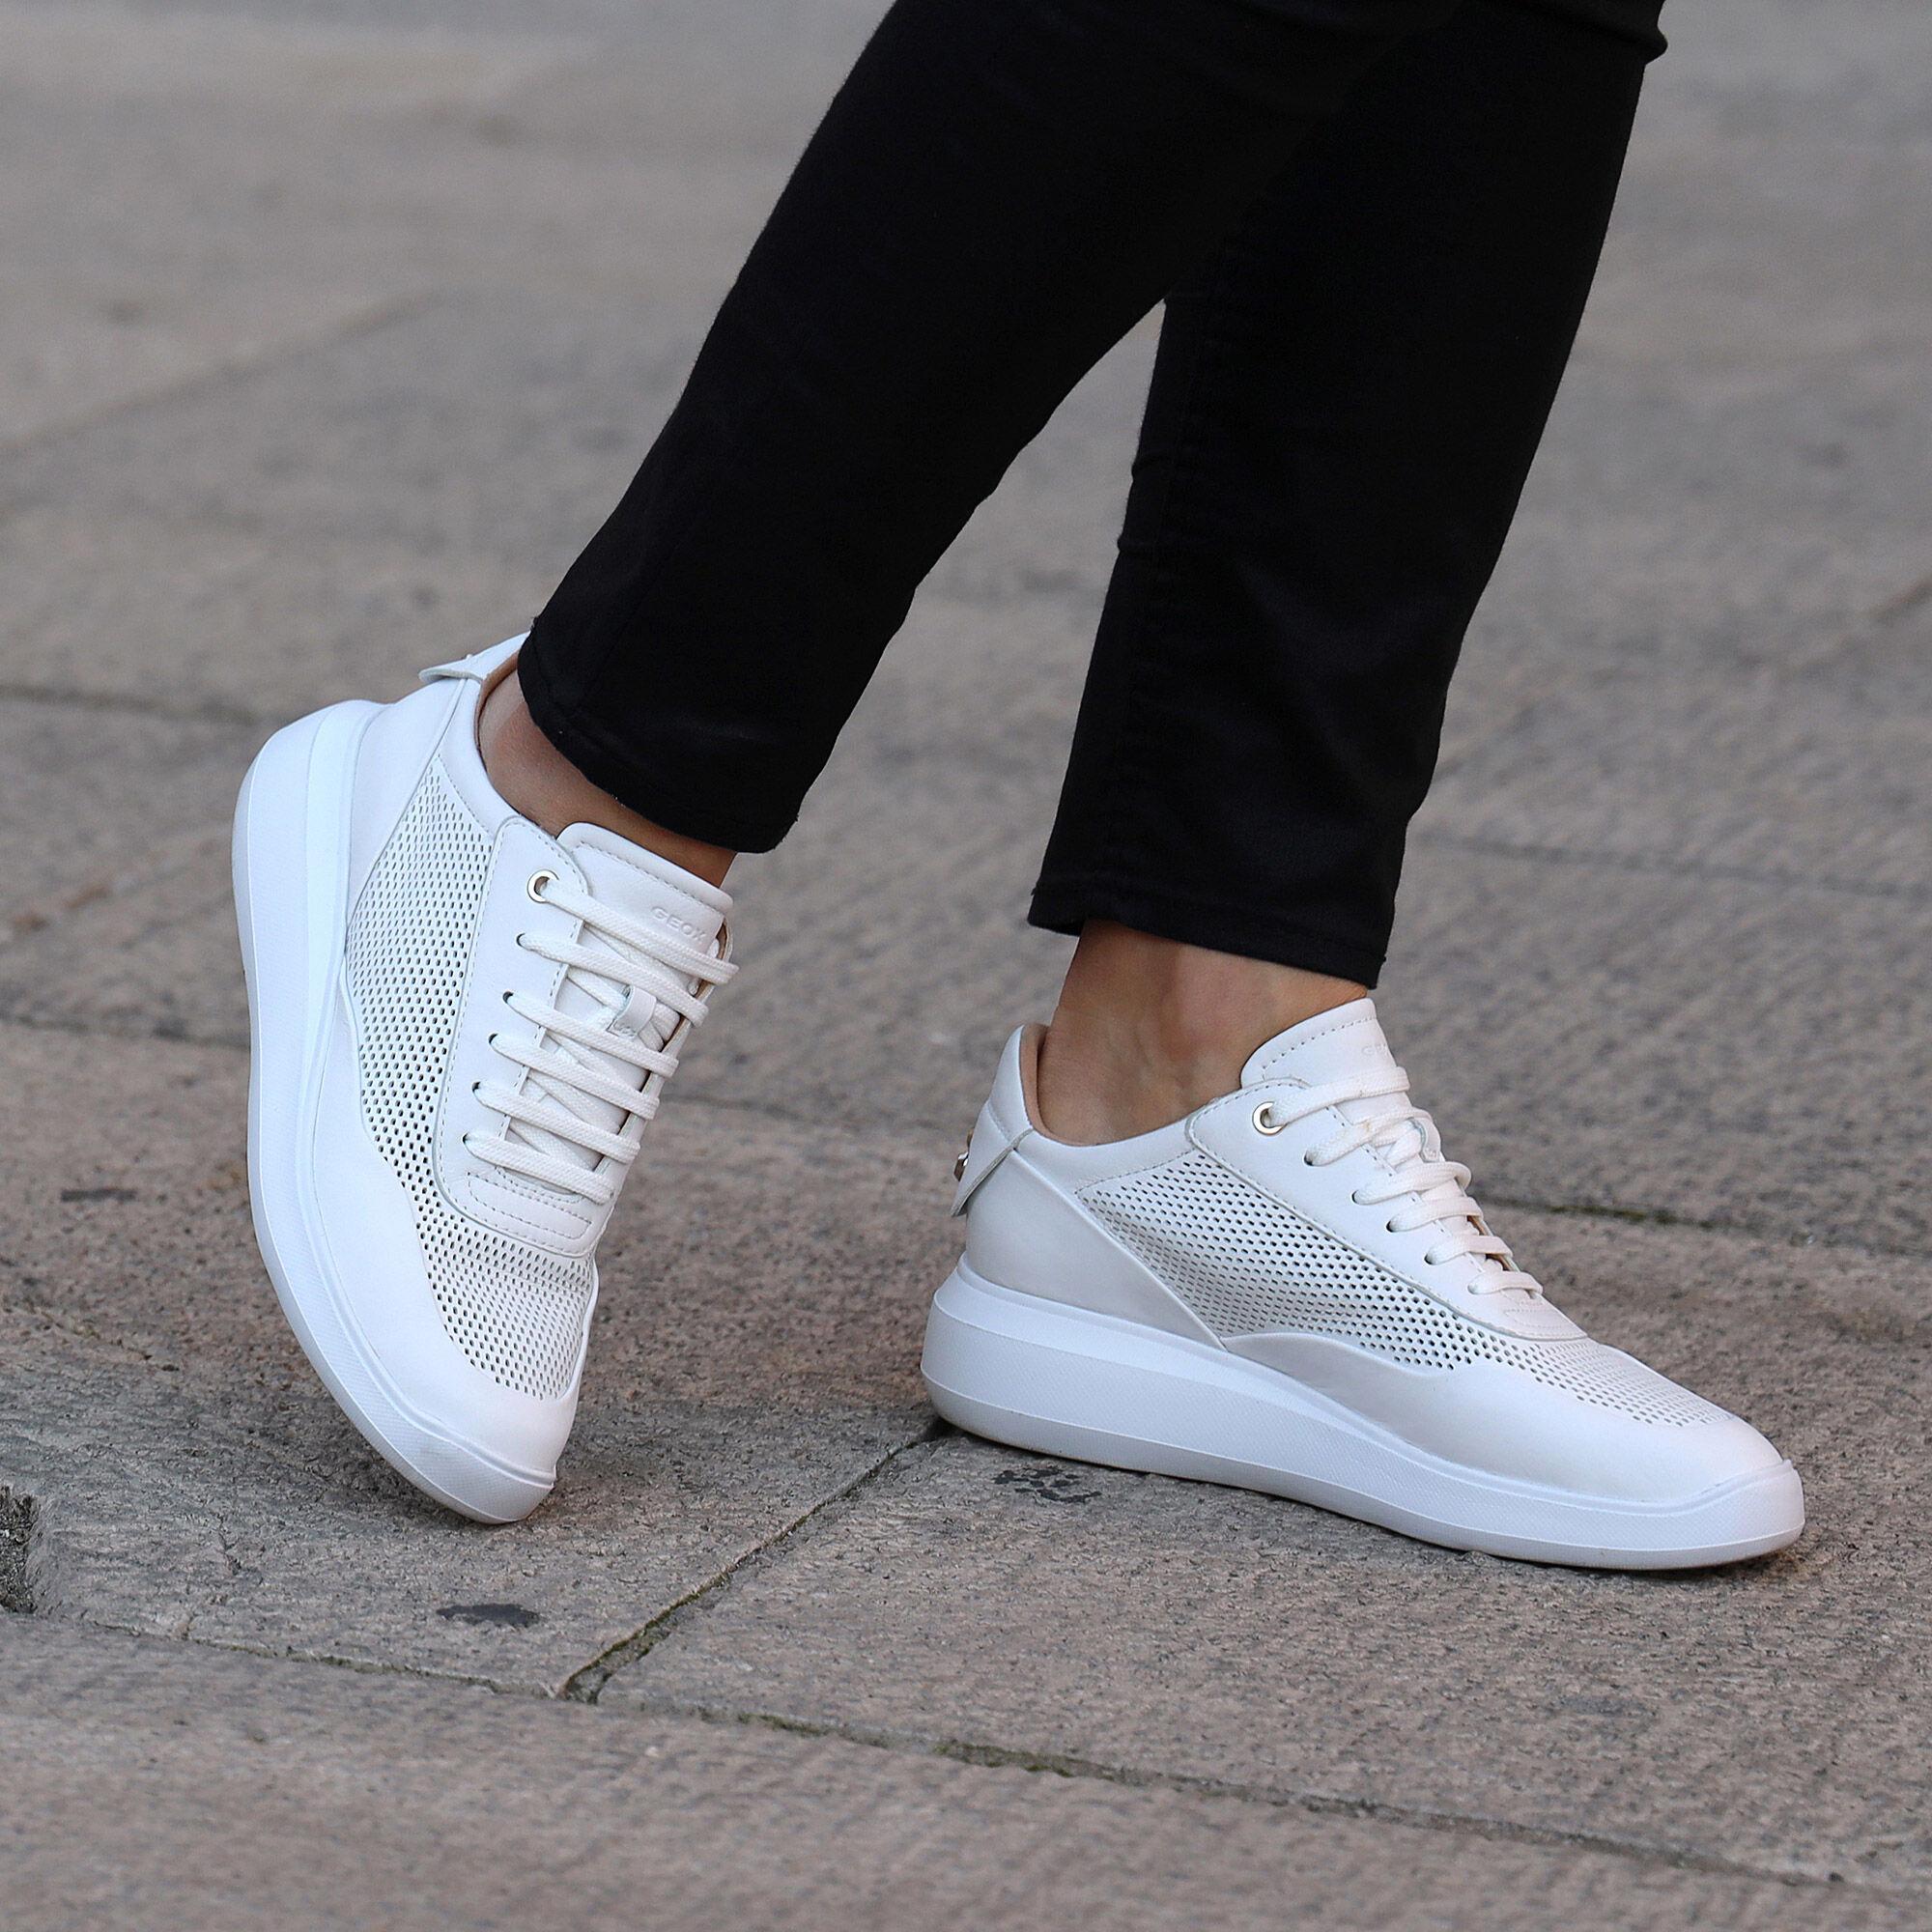 geox shoes USA website, Geox men's u nebula f low top